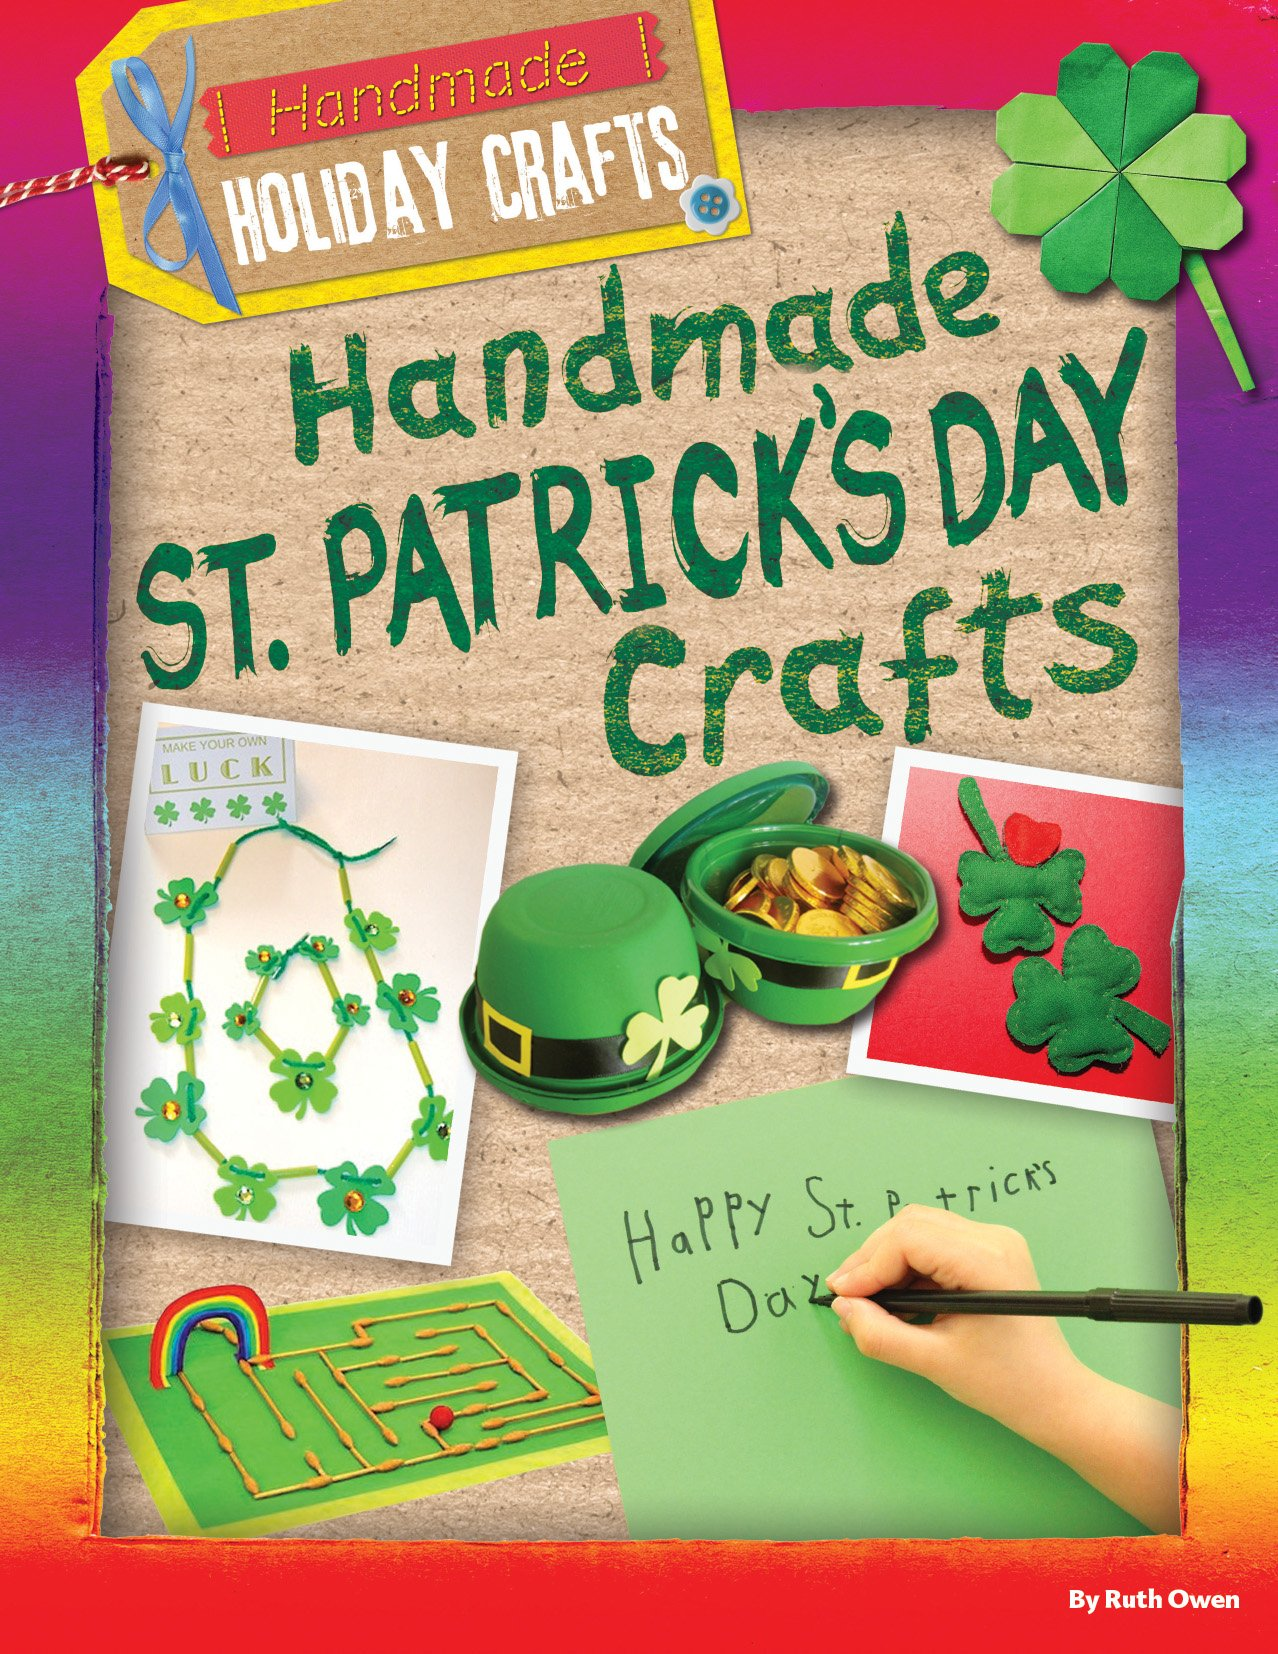 Handmade St. Patrick's Day Crafts (Handmade Holiday Crafts) by Gareth Stevens Pub (Image #1)